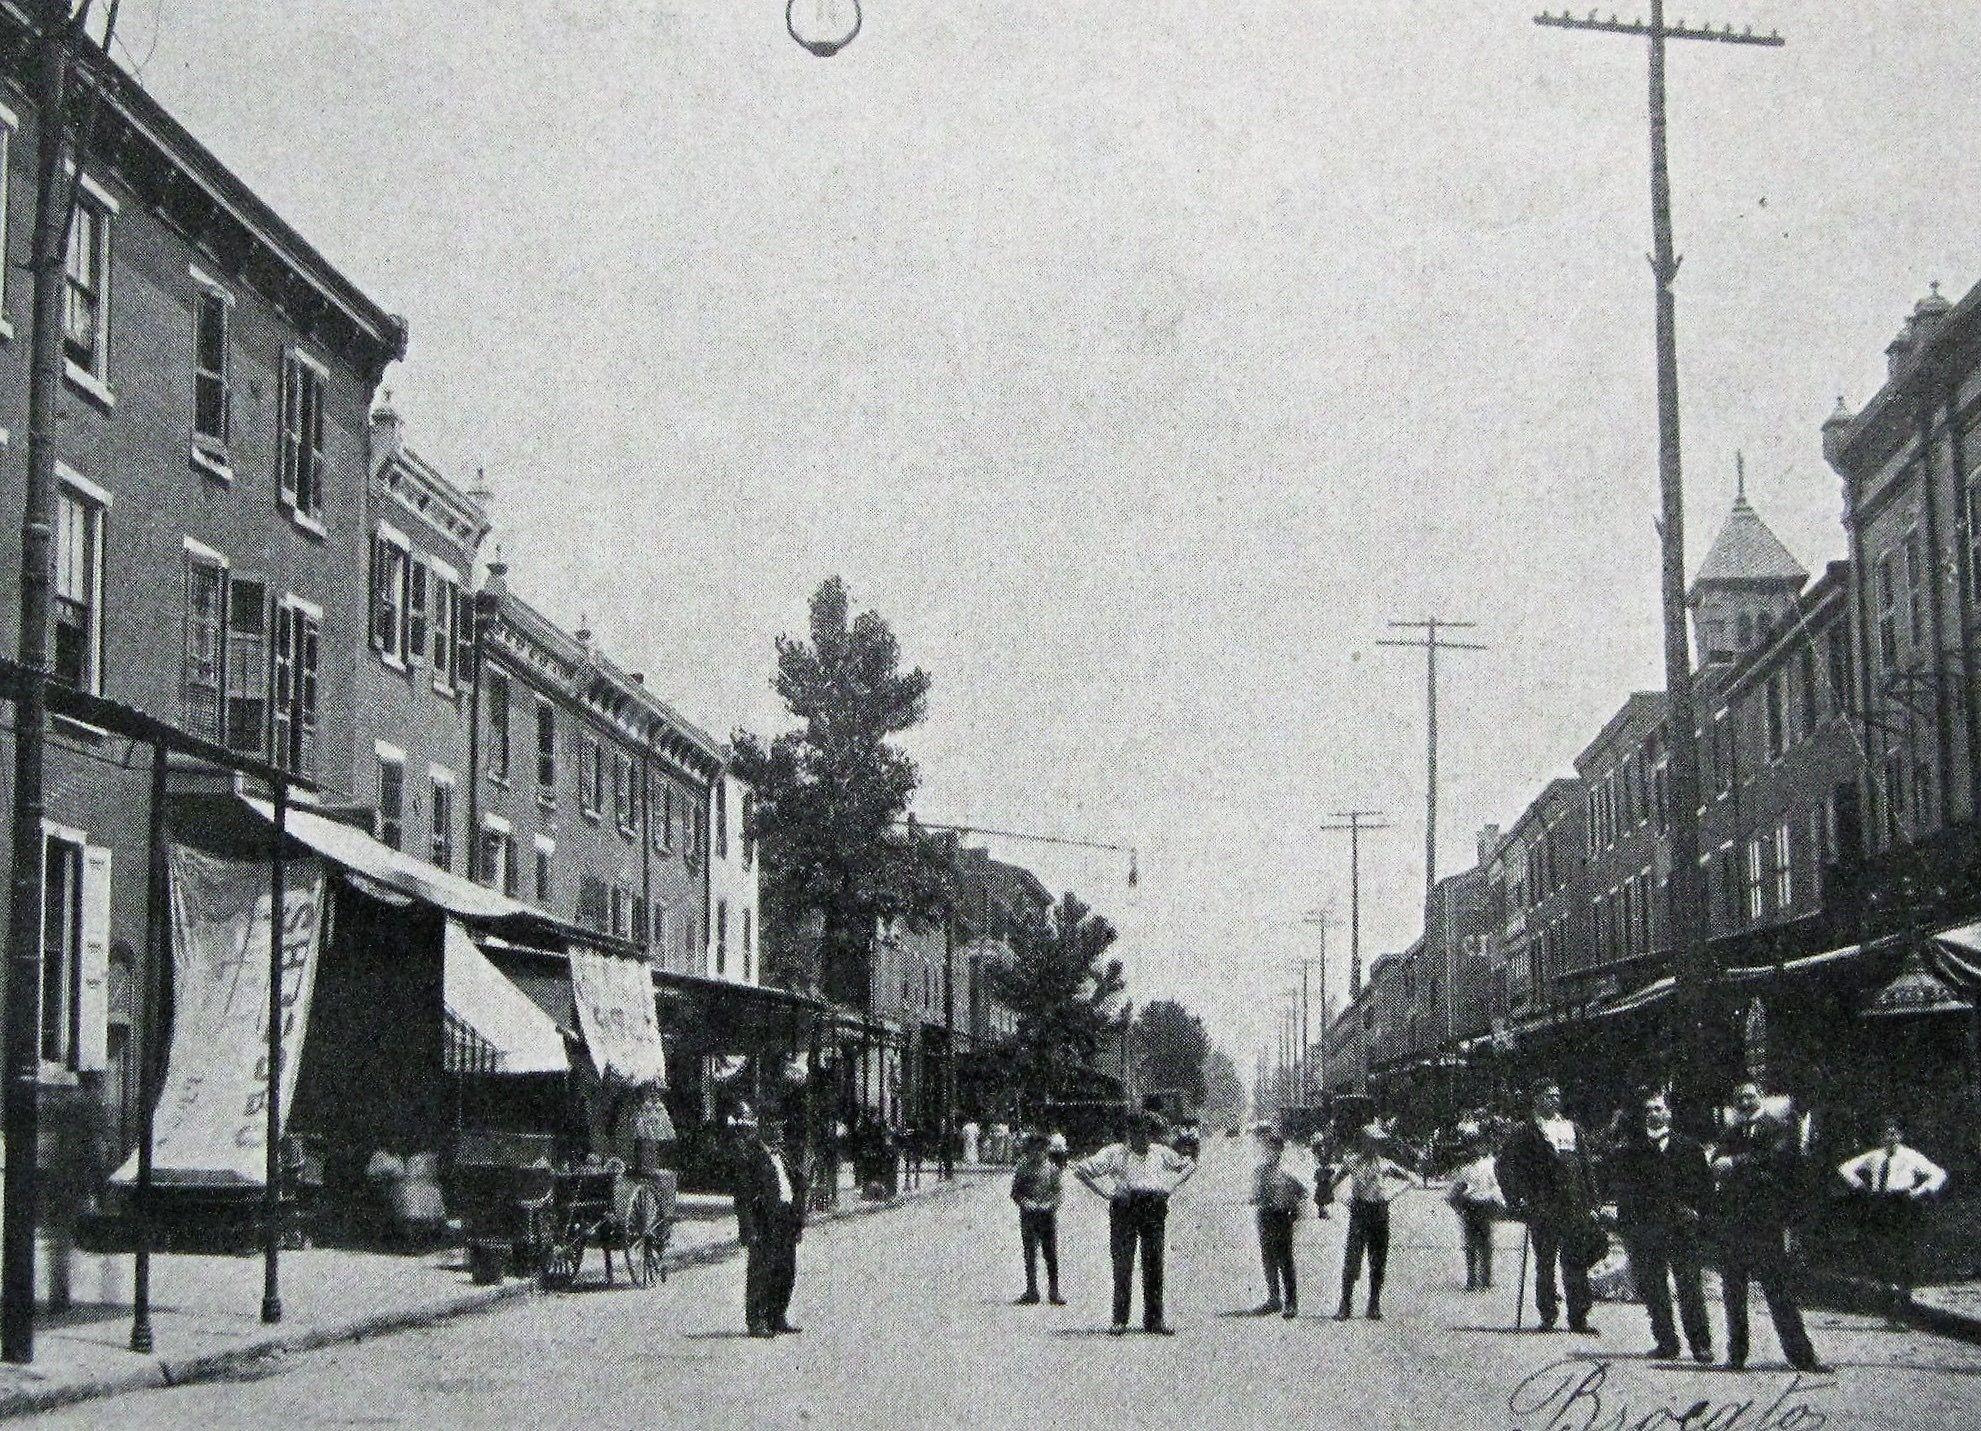 STREET CREW: 9th & Christian, Philadelphia 1906. Original caption ...